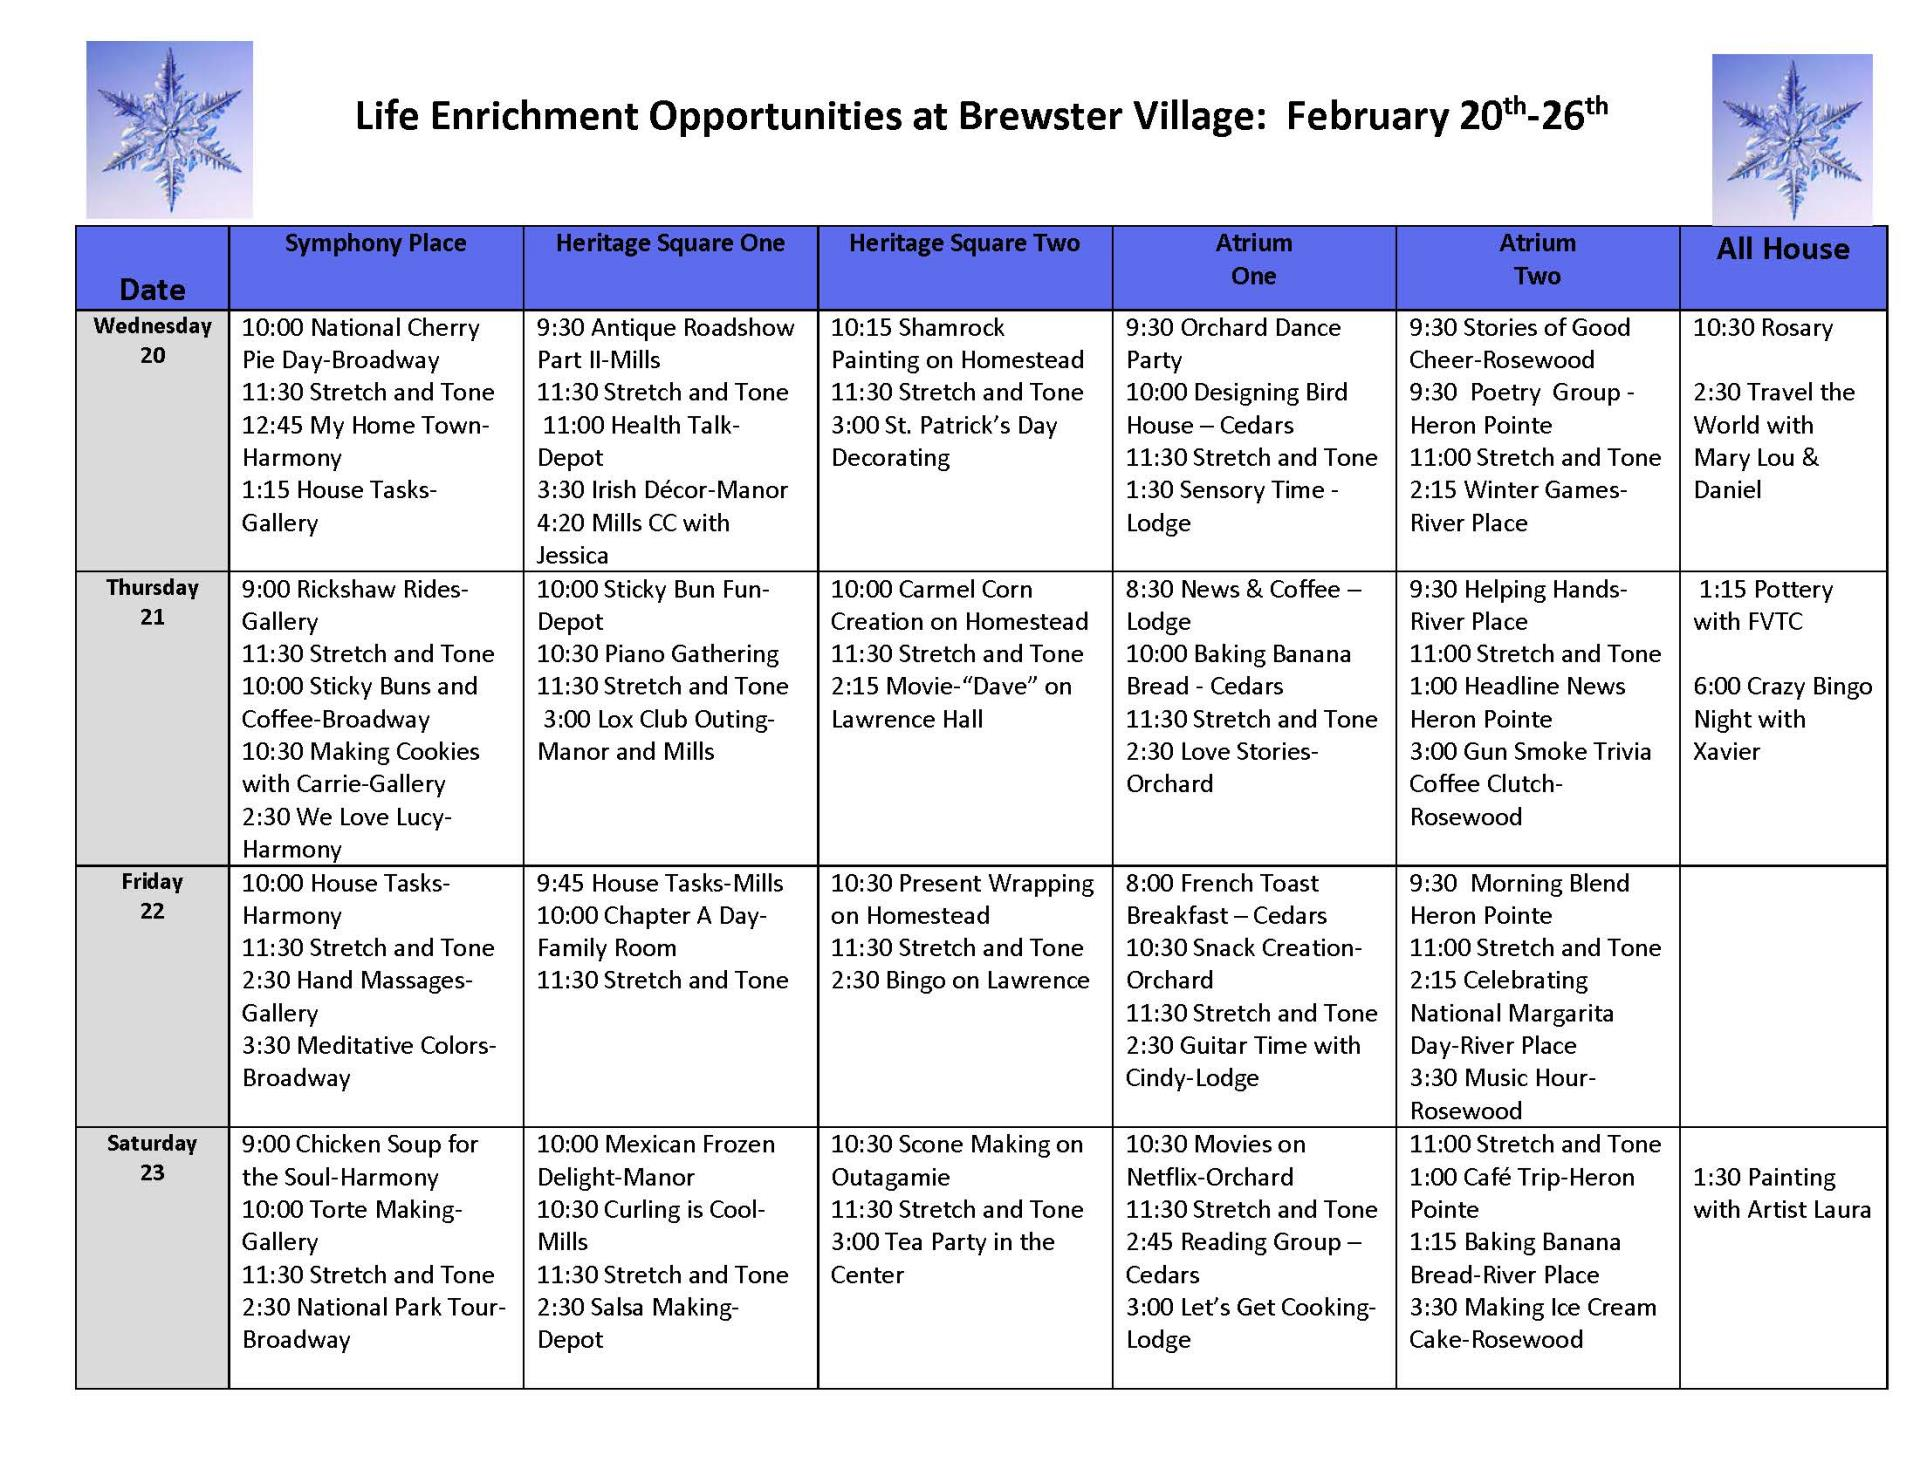 Life Enrichment February 20-26   Calendar of Events